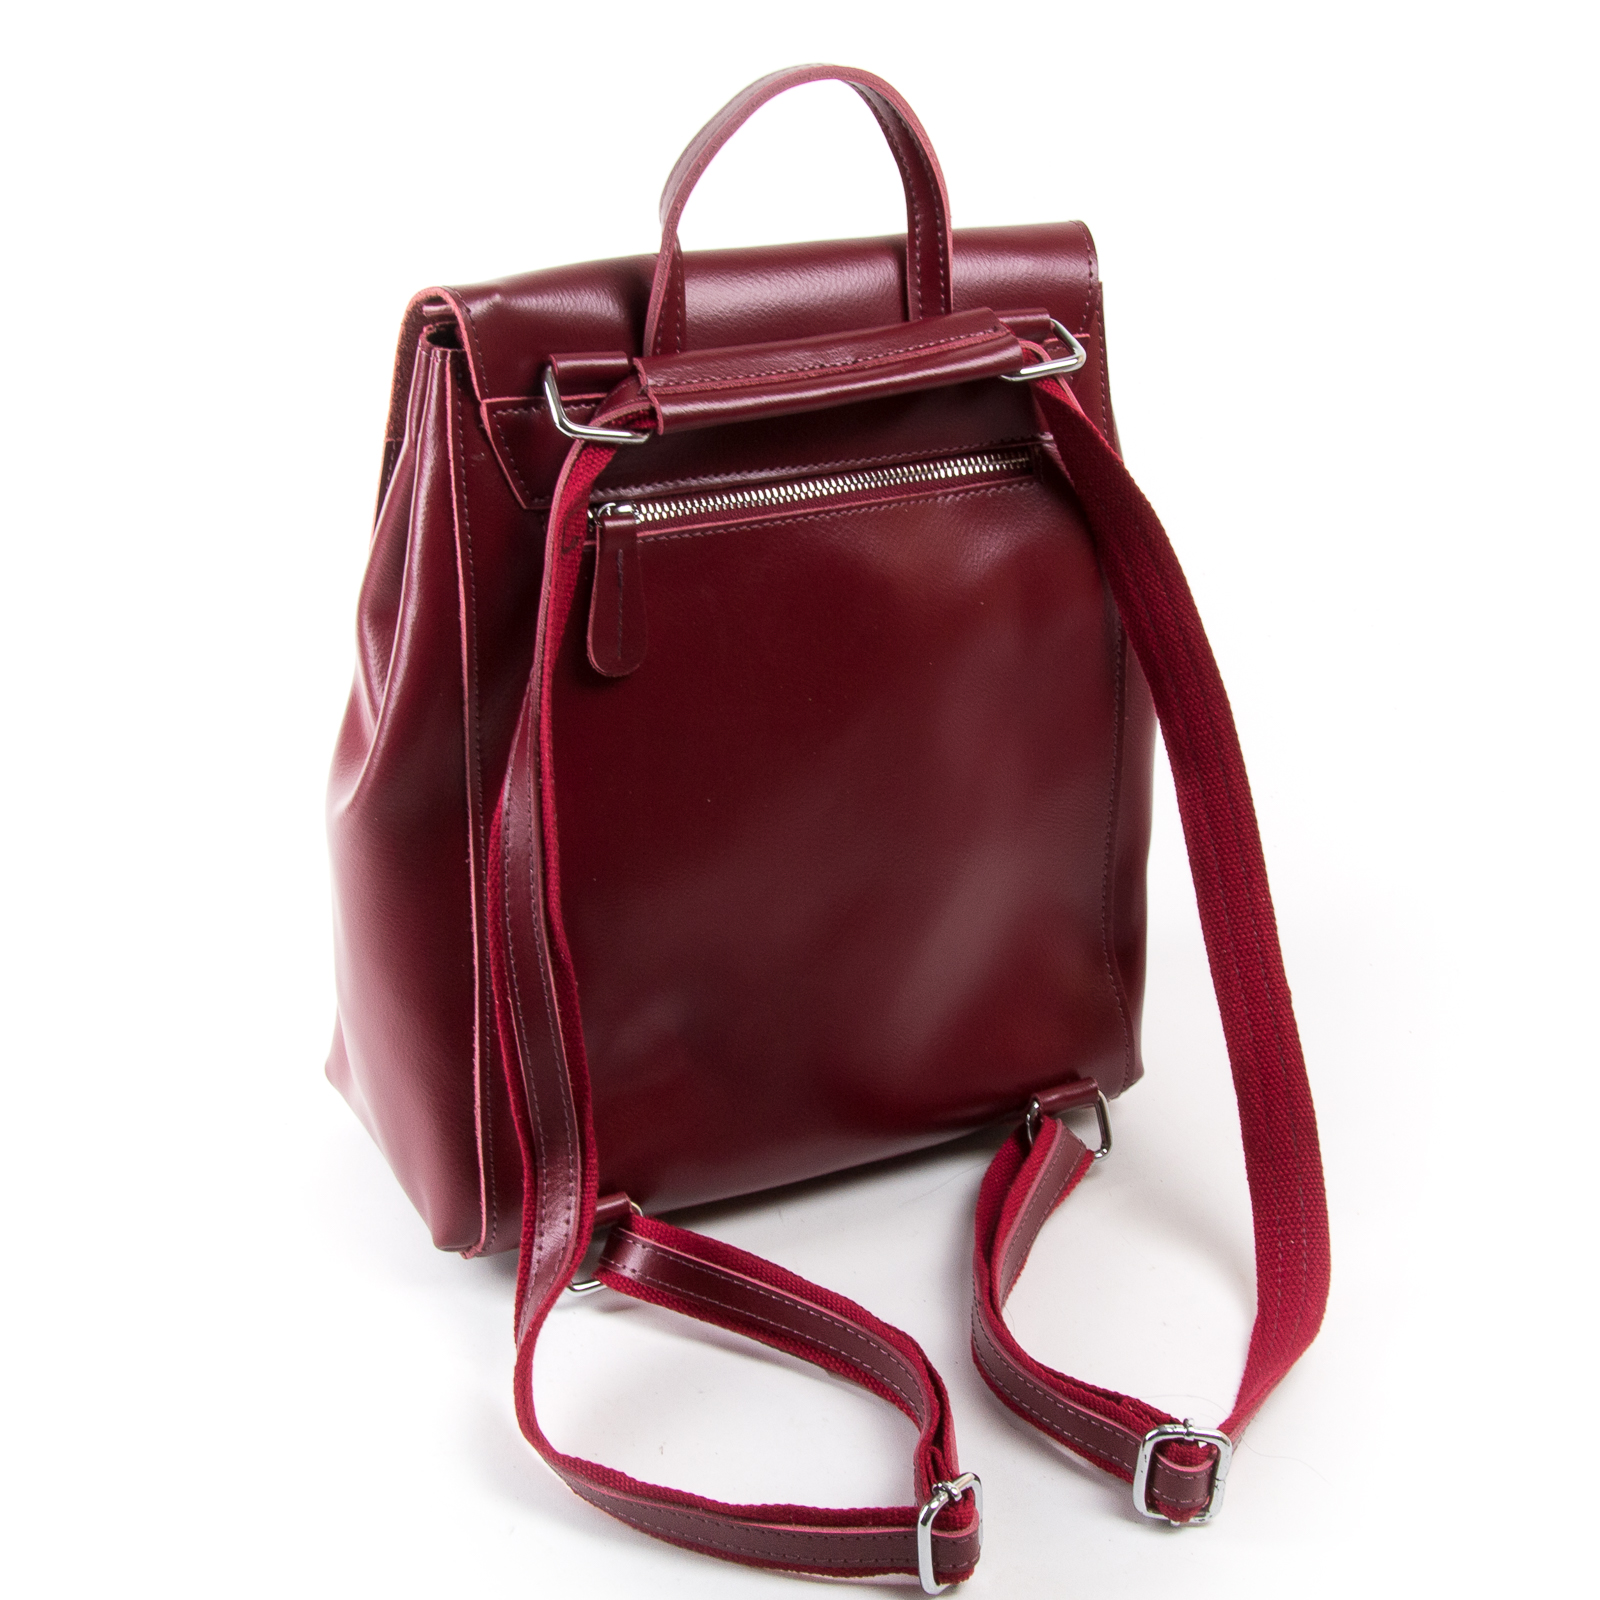 Сумка Женская Рюкзак кожа ALEX RAI 03-01 373 light-red - фото 4